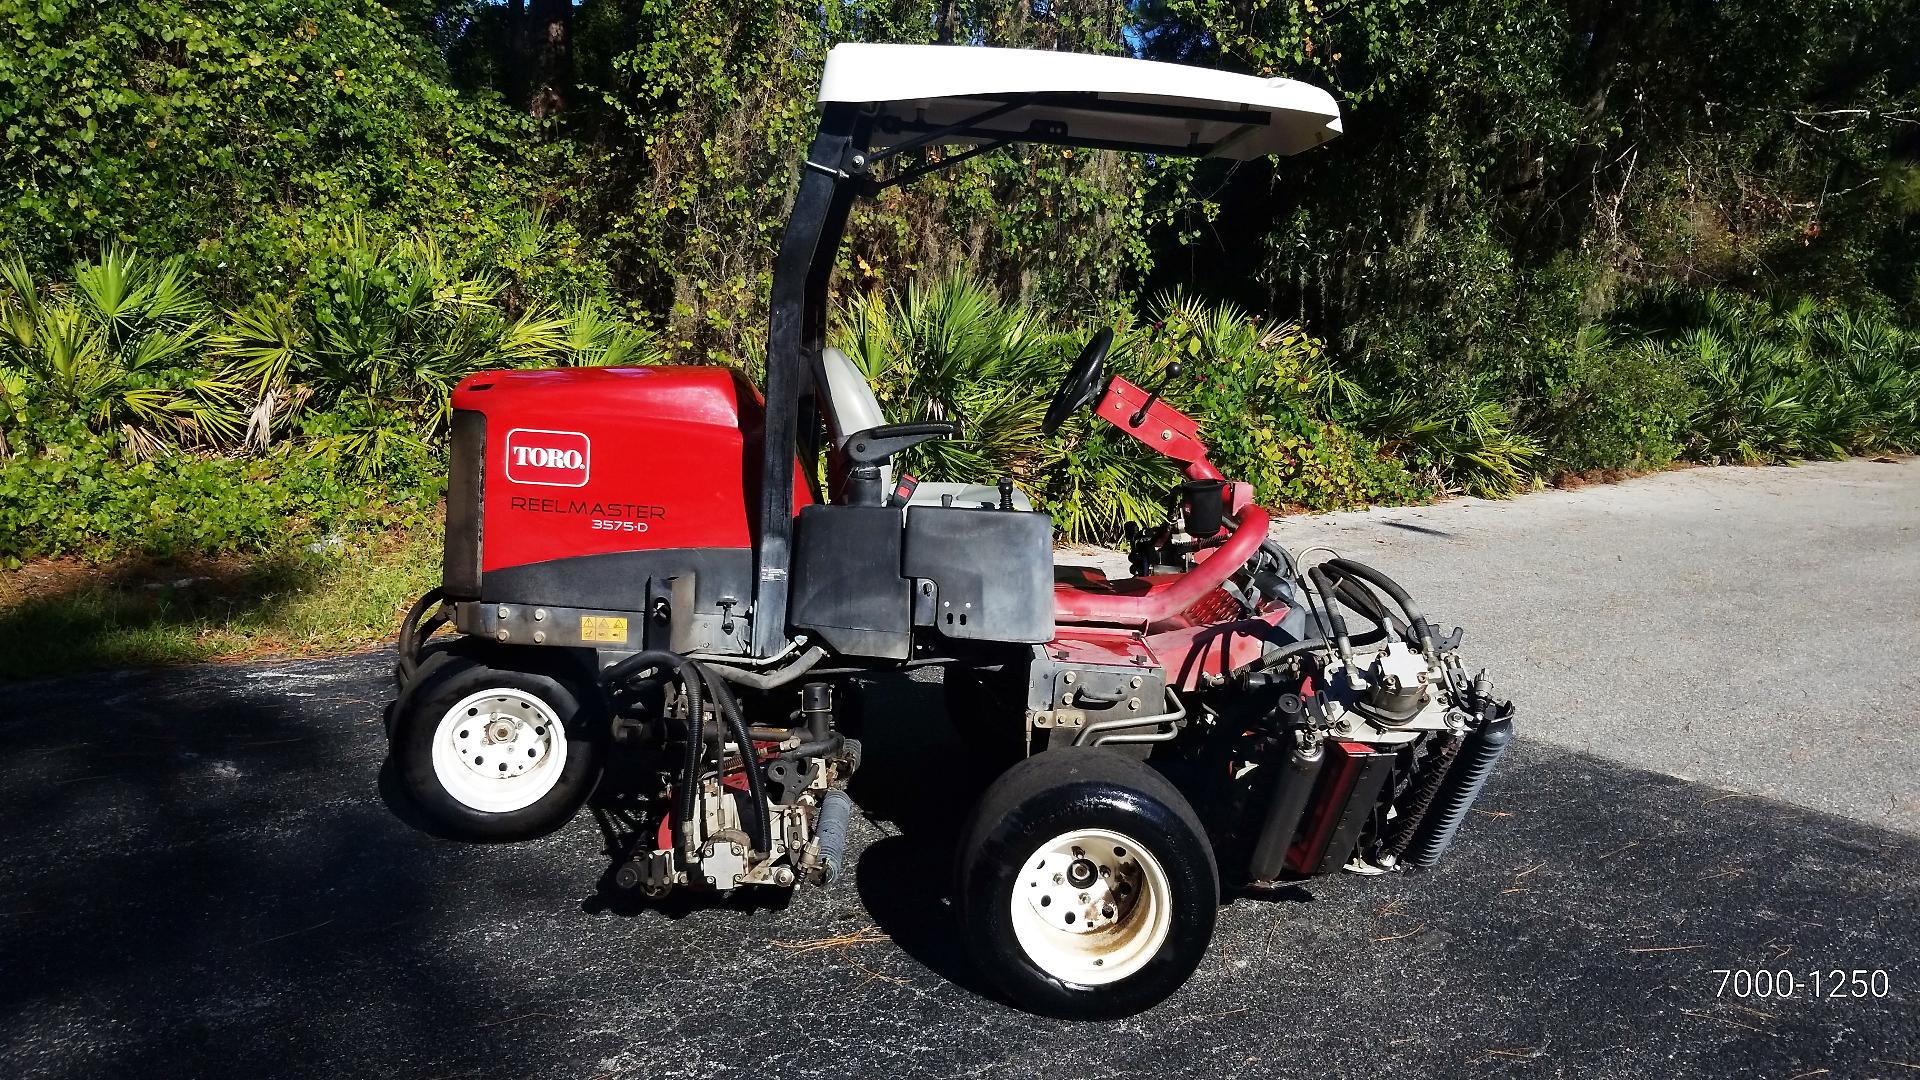 Toro Reelmaster 3575-D